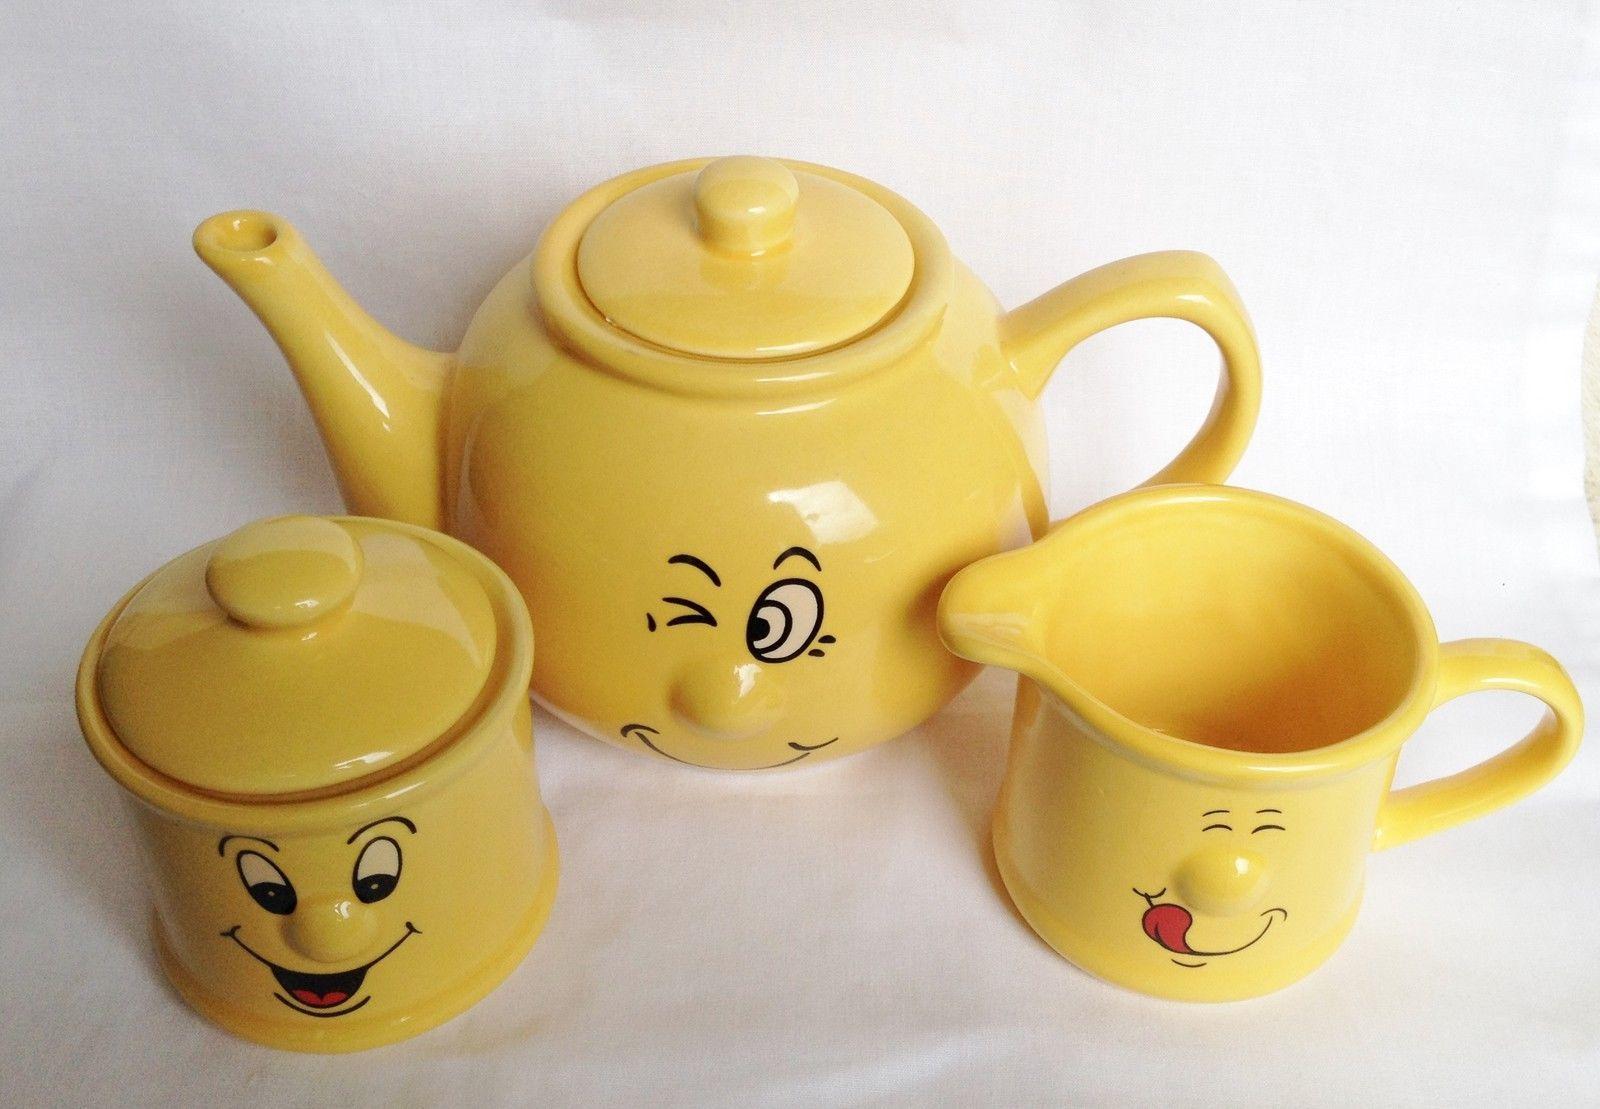 Yellow sugar bowls with lids - Trade Winds Funny Faces Yellow Teapot Milk Jug And Sugar Bowl Ceramic Ebay